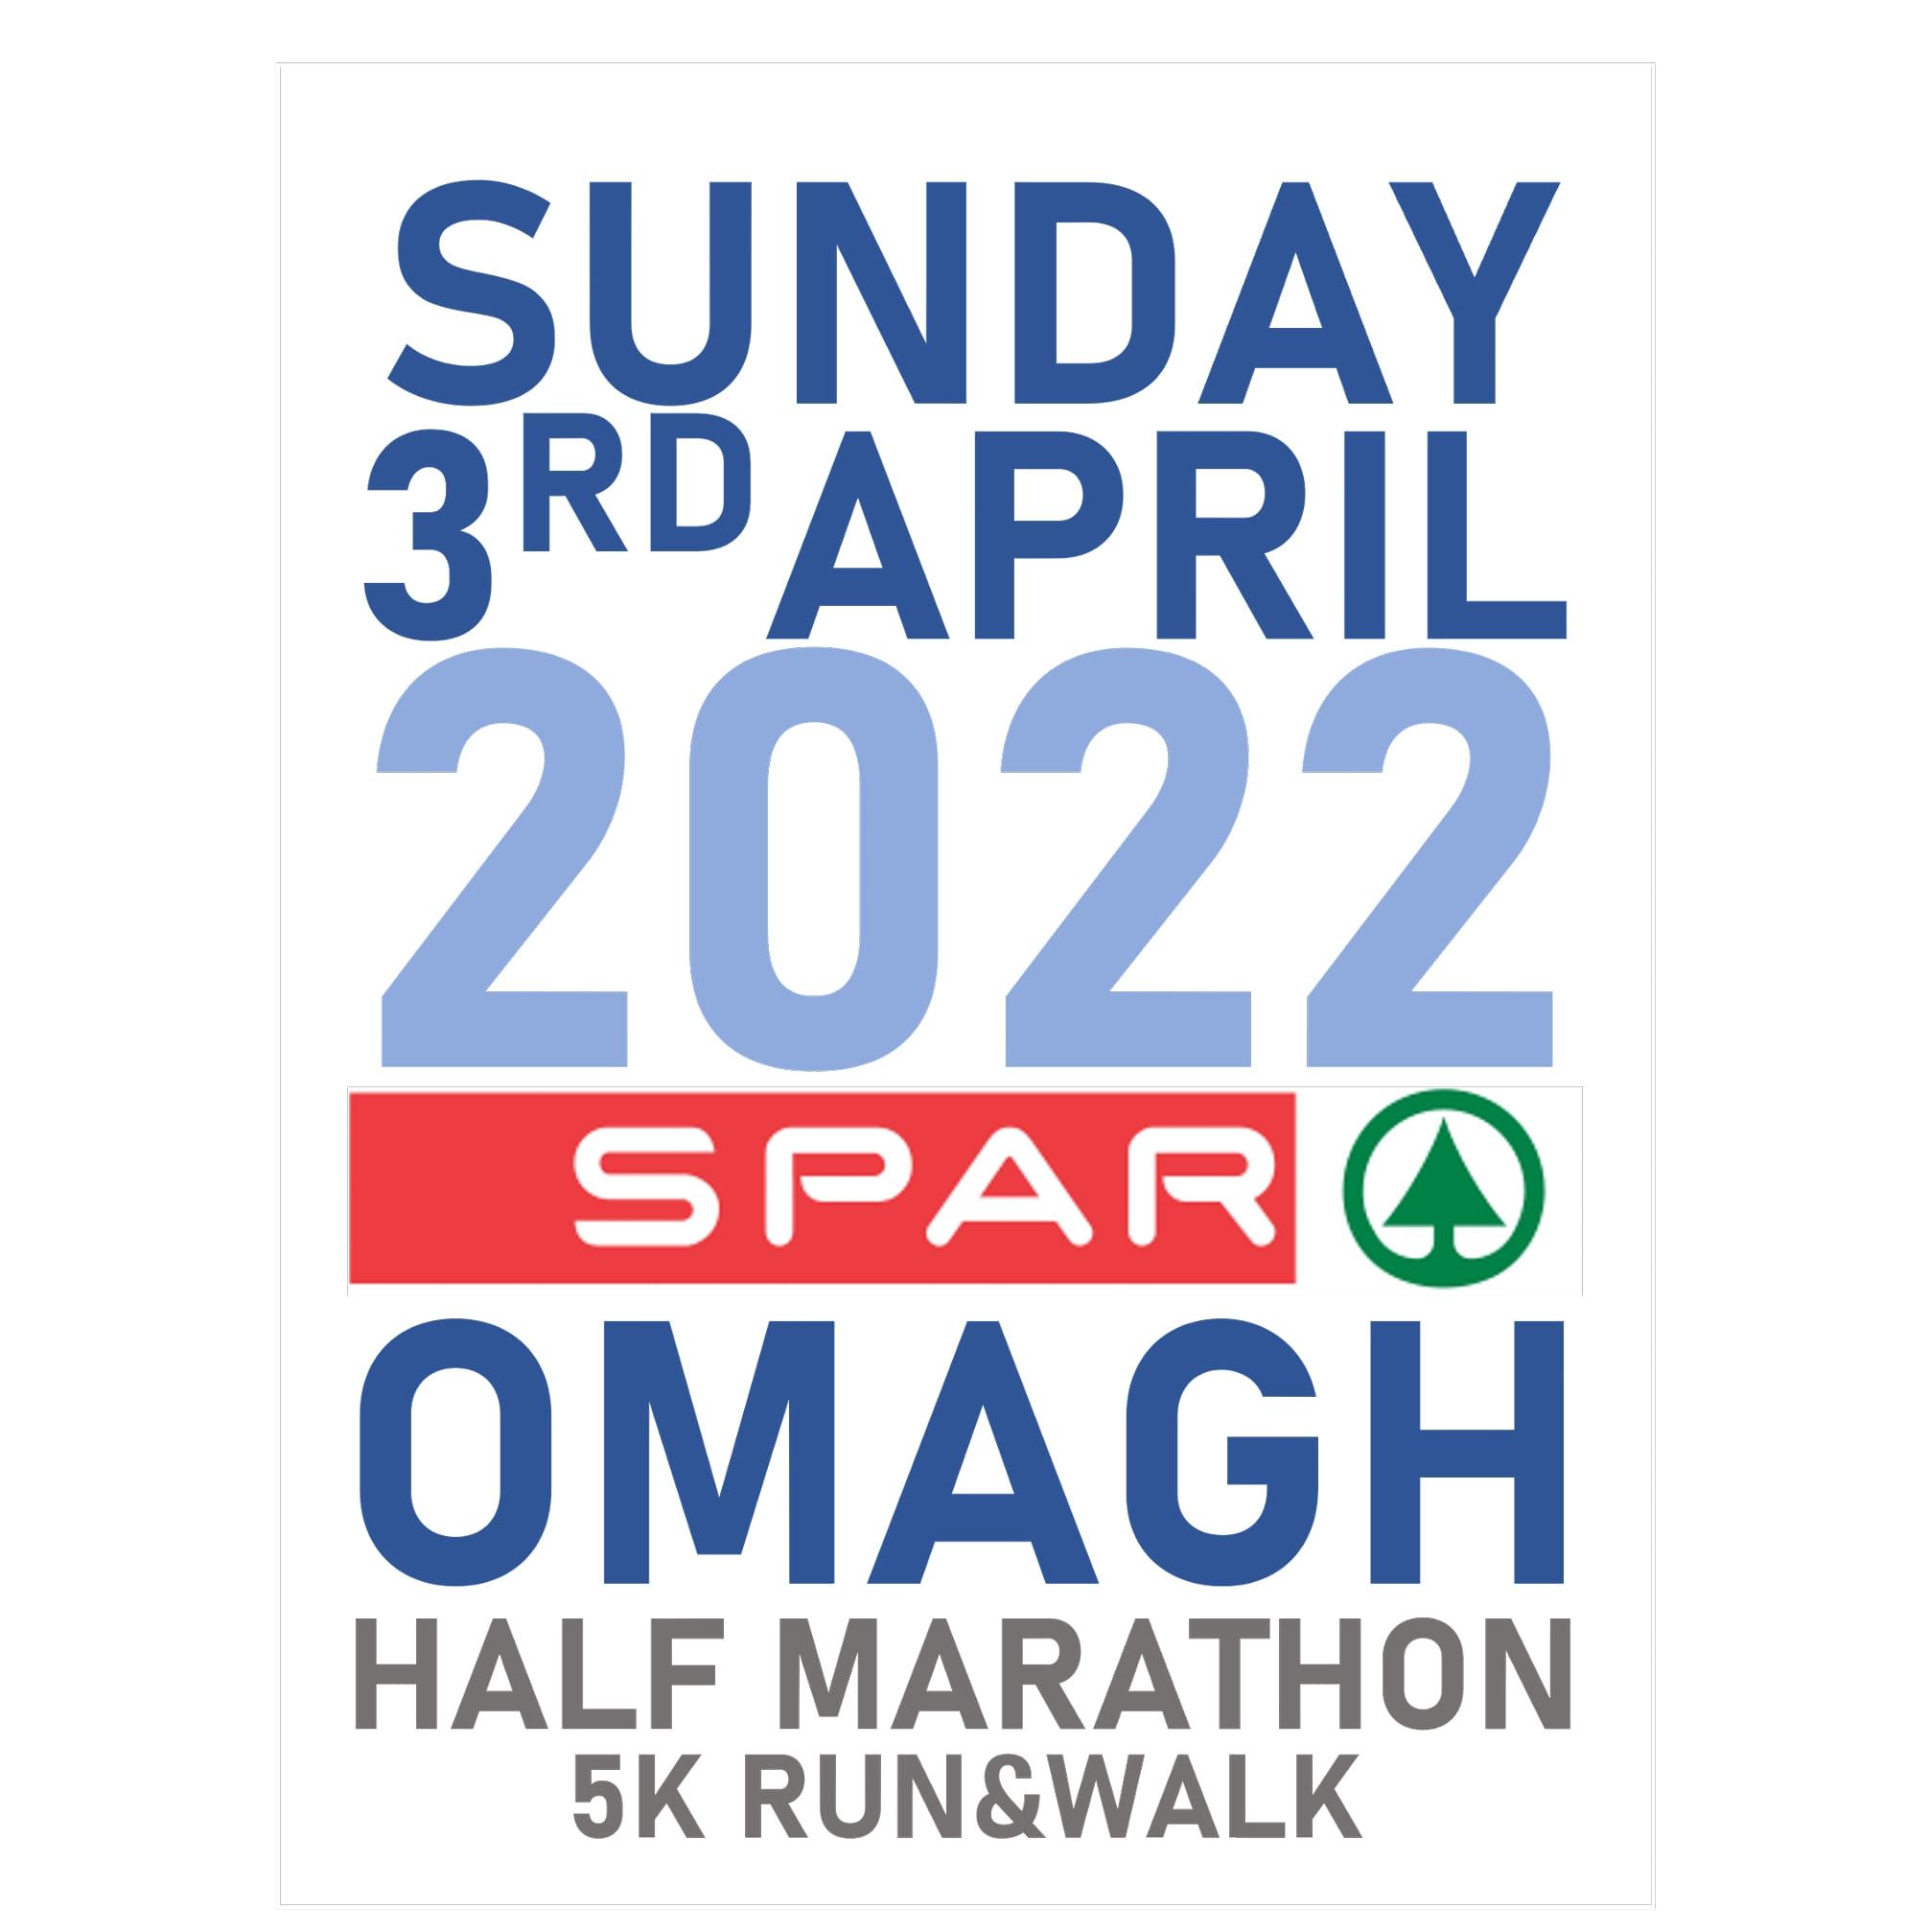 Omagh Half Marathon 2022